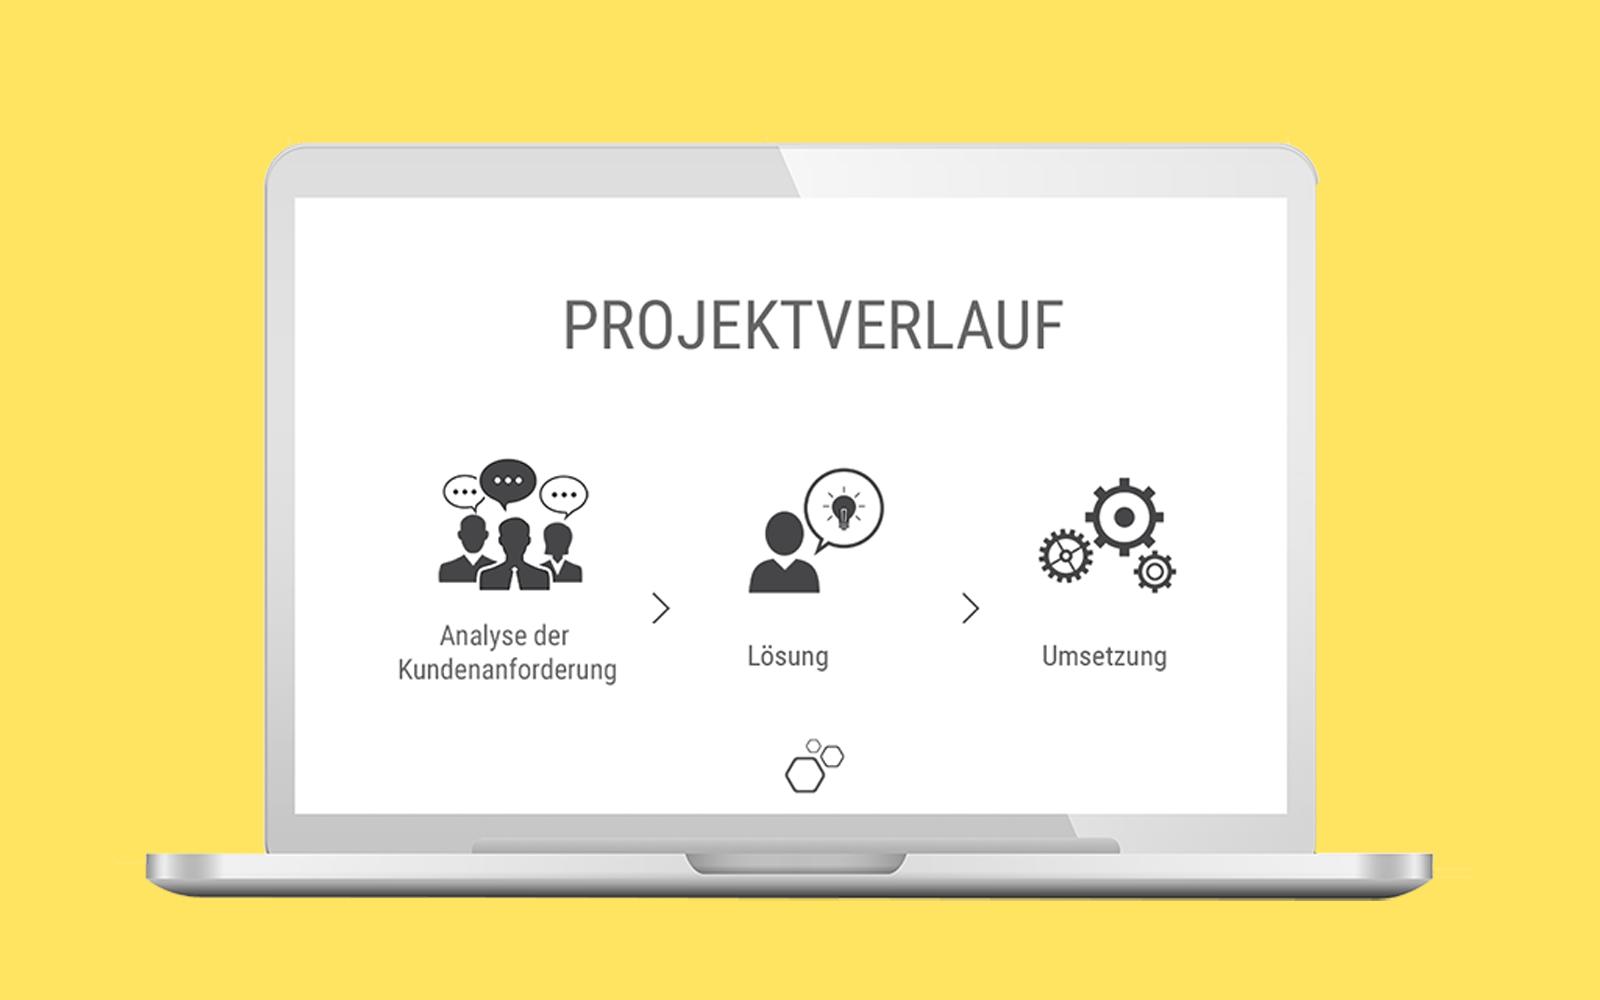 OTE GmbH- Projektverlauf